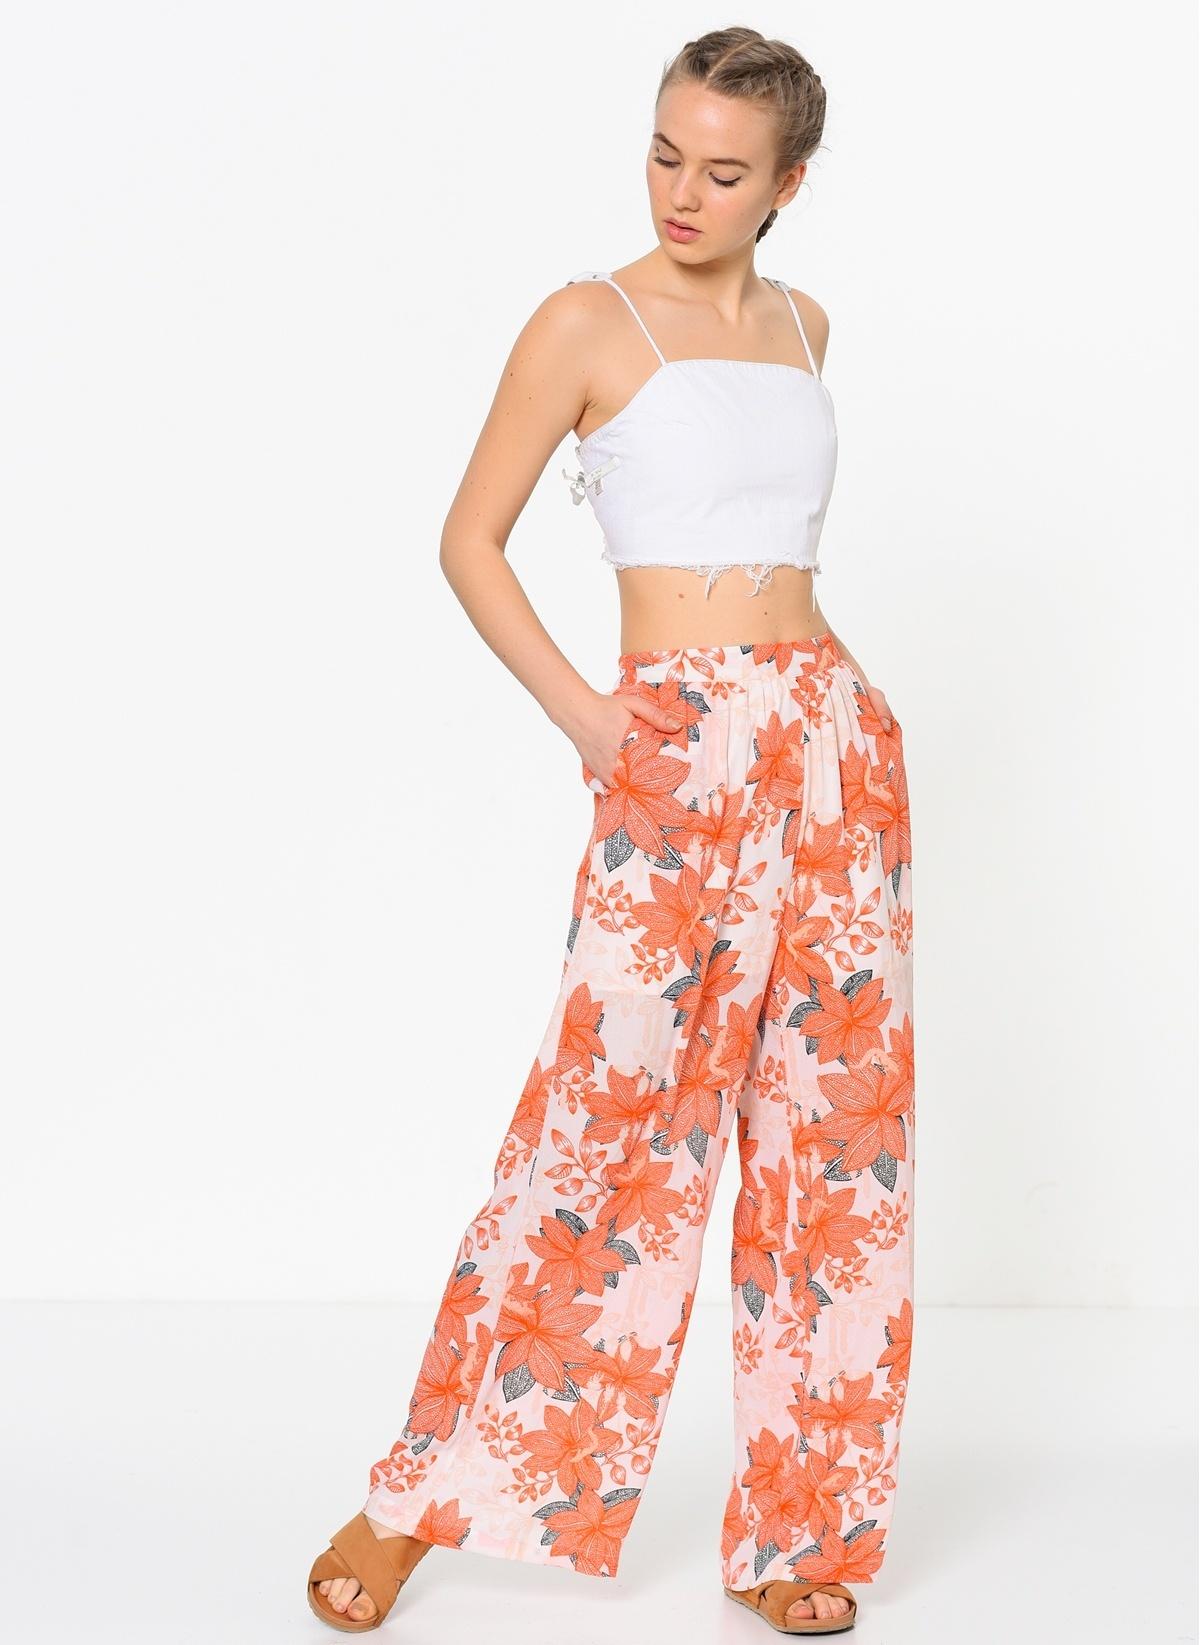 Vero Moda Pantolon 10152669 Vmflora Wide Pants D2-3 – 69.9 TL